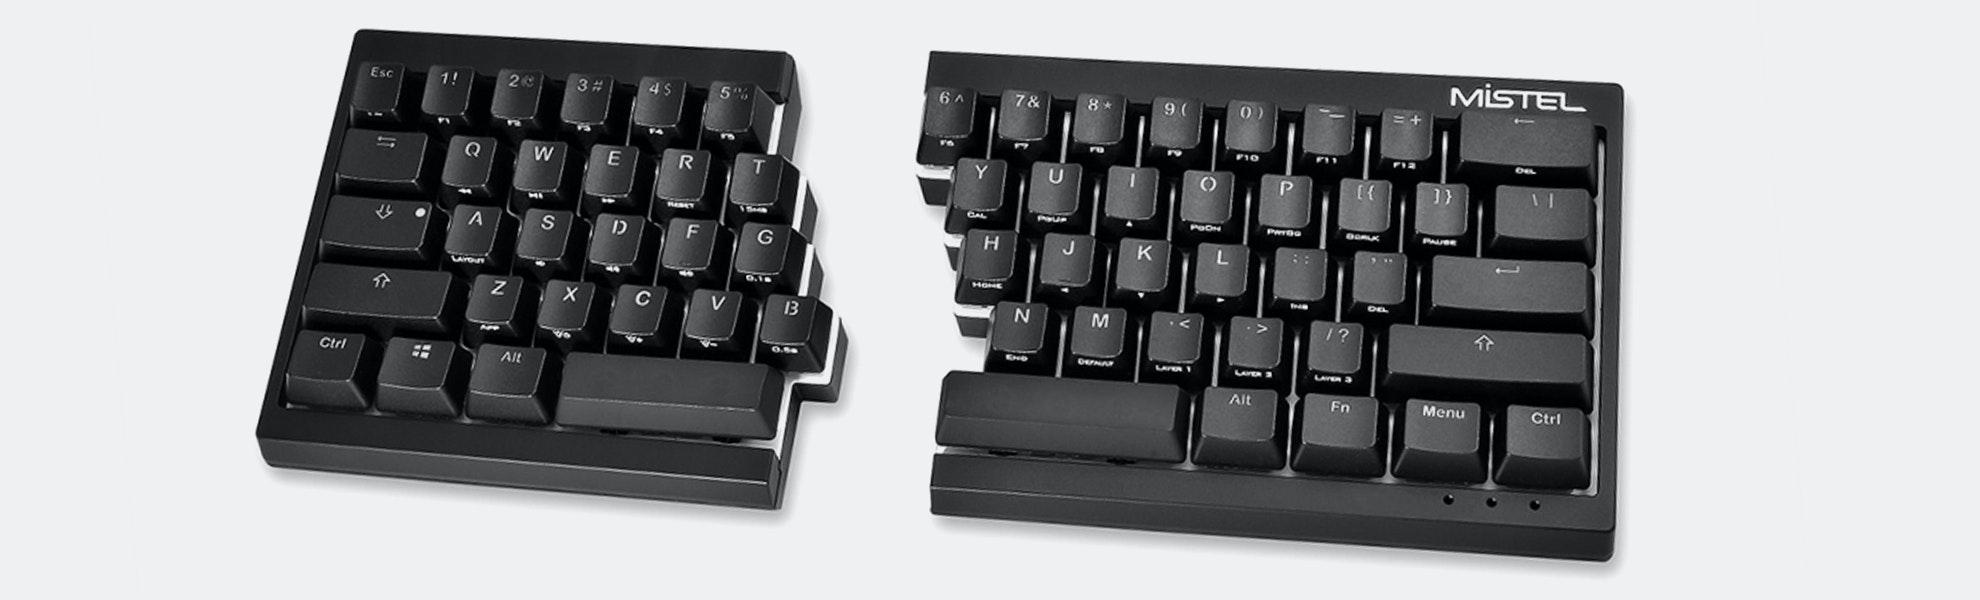 Mistel Barocco MD600 Mechanical Keyboard